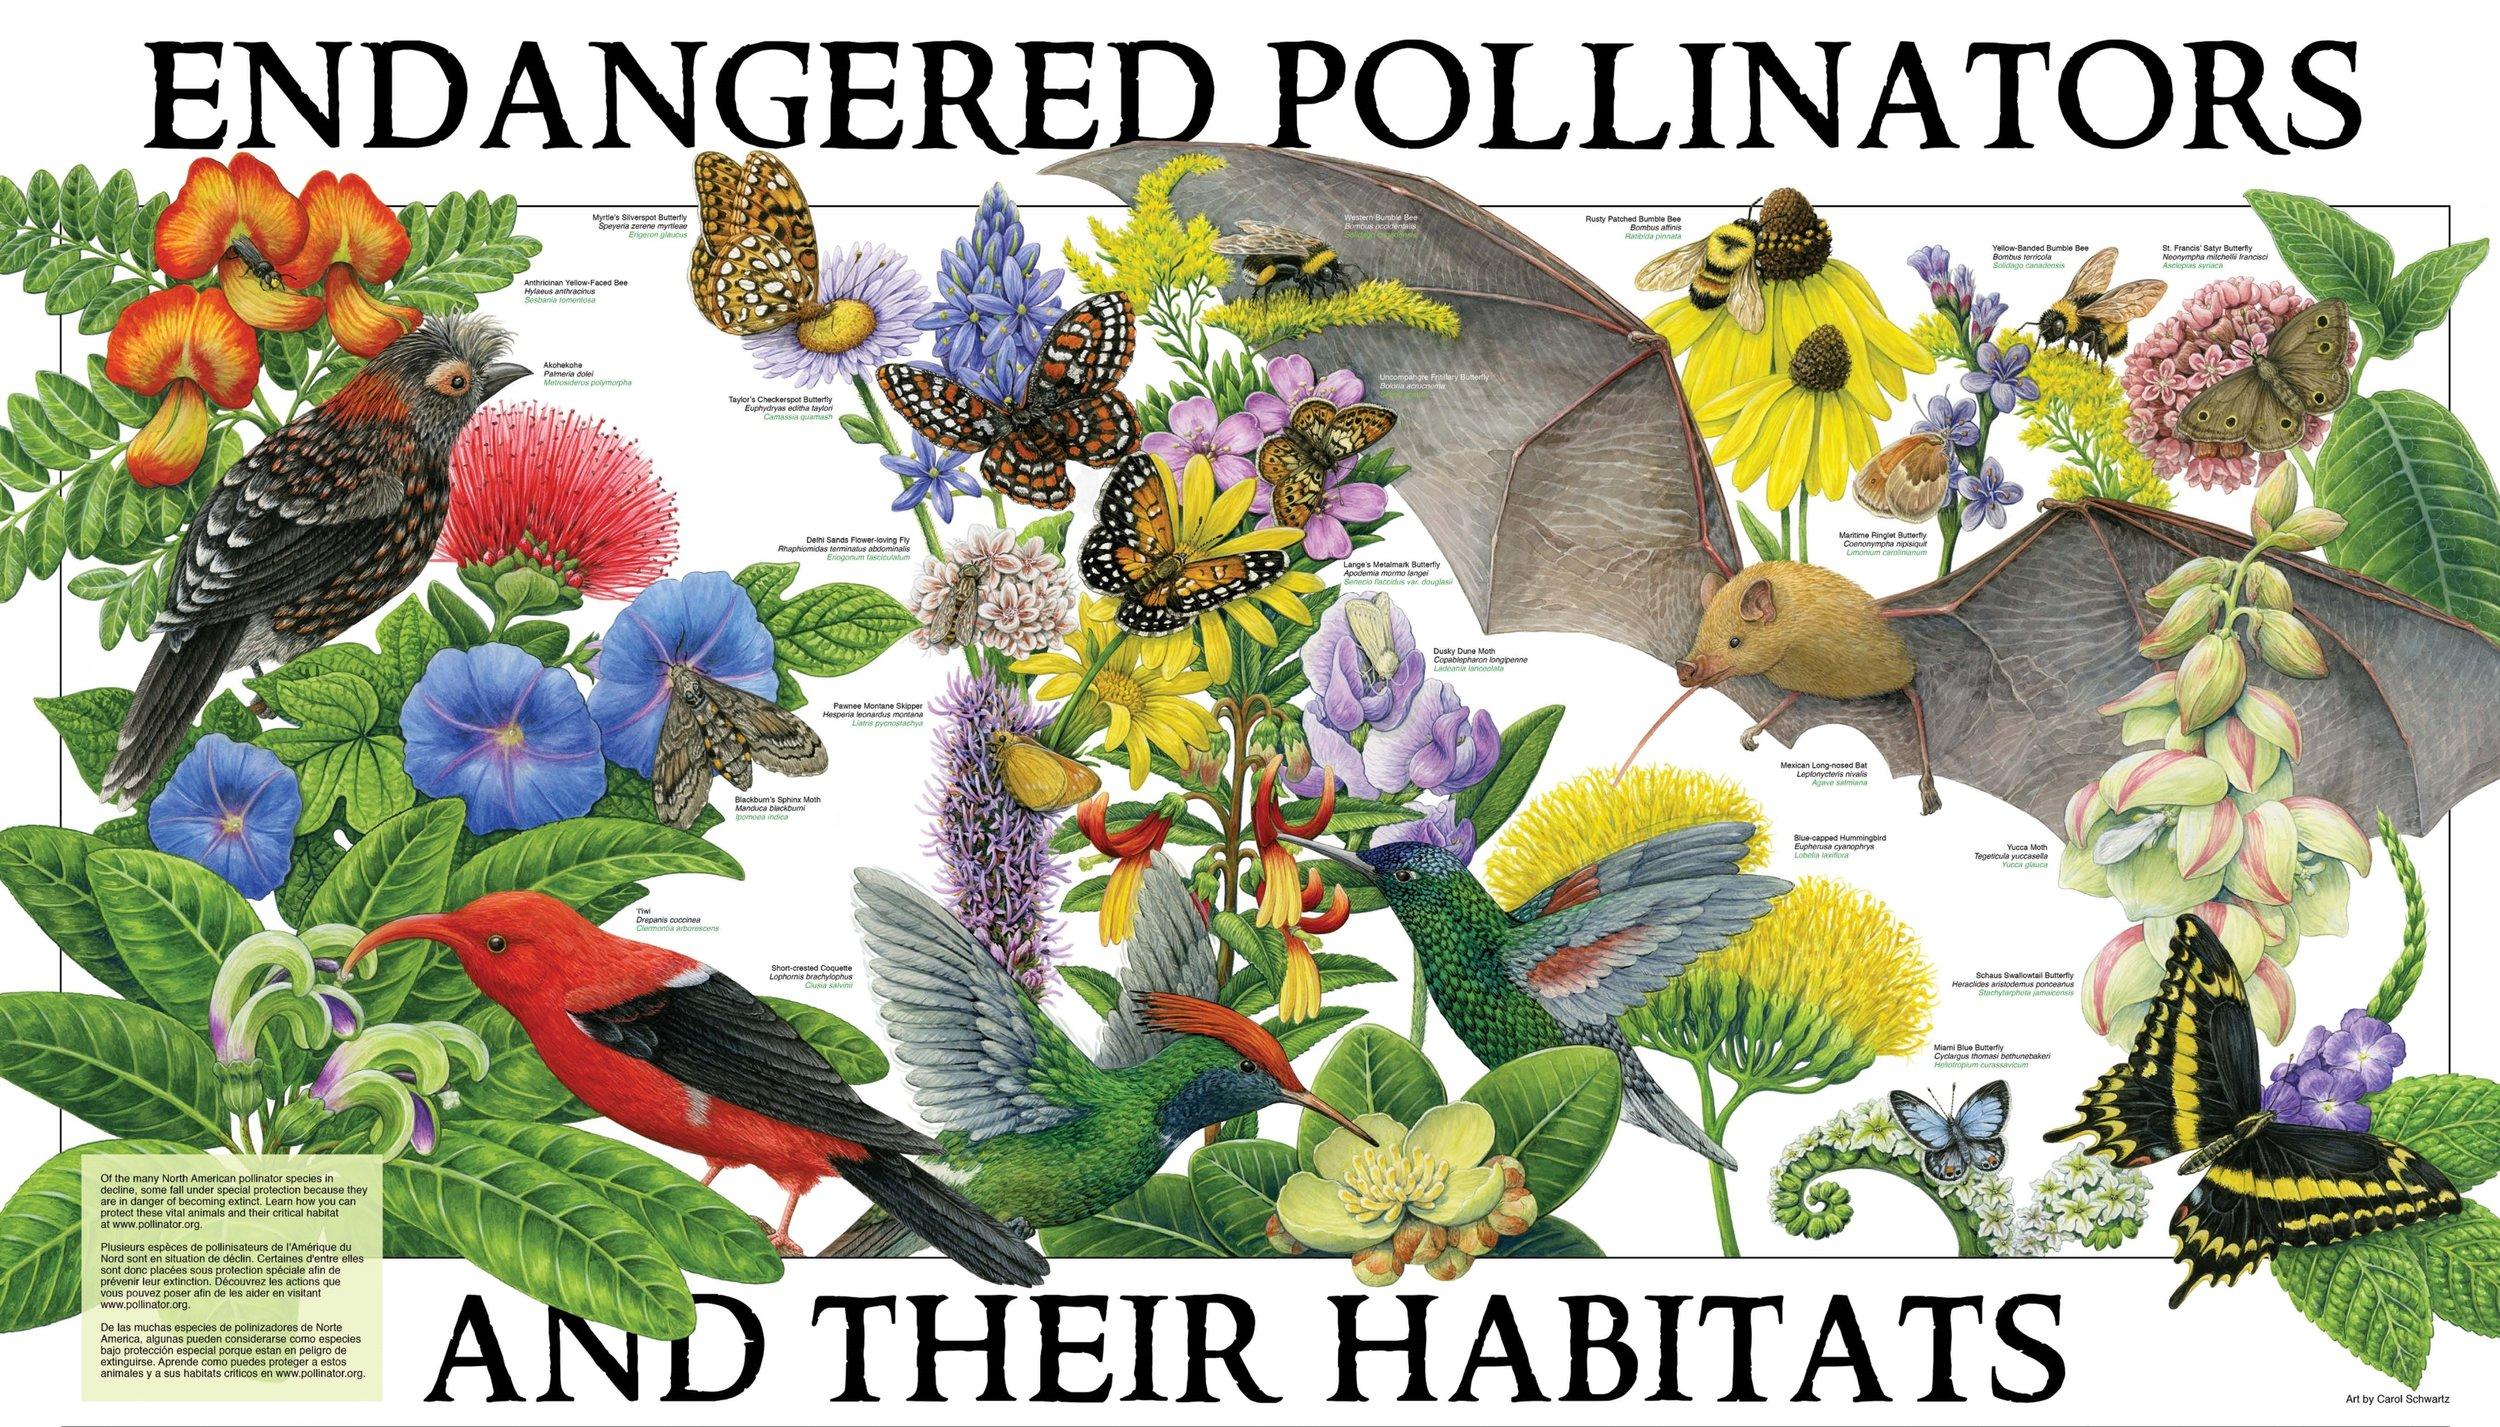 Source:  Pollinator Partnership